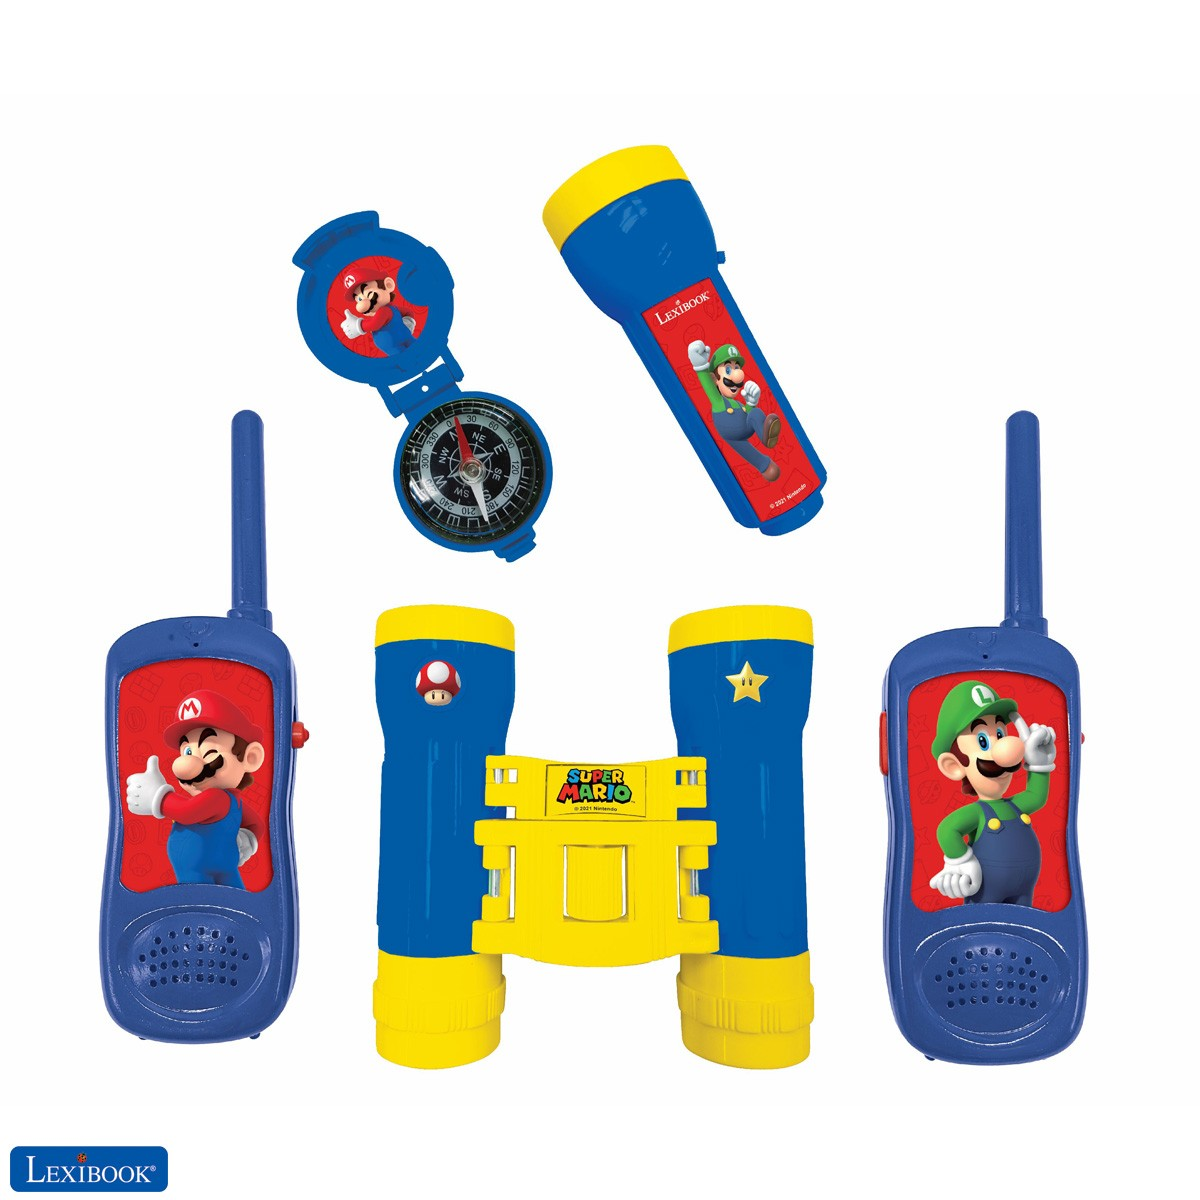 Nintendo Super Mario Walkie-Talkies